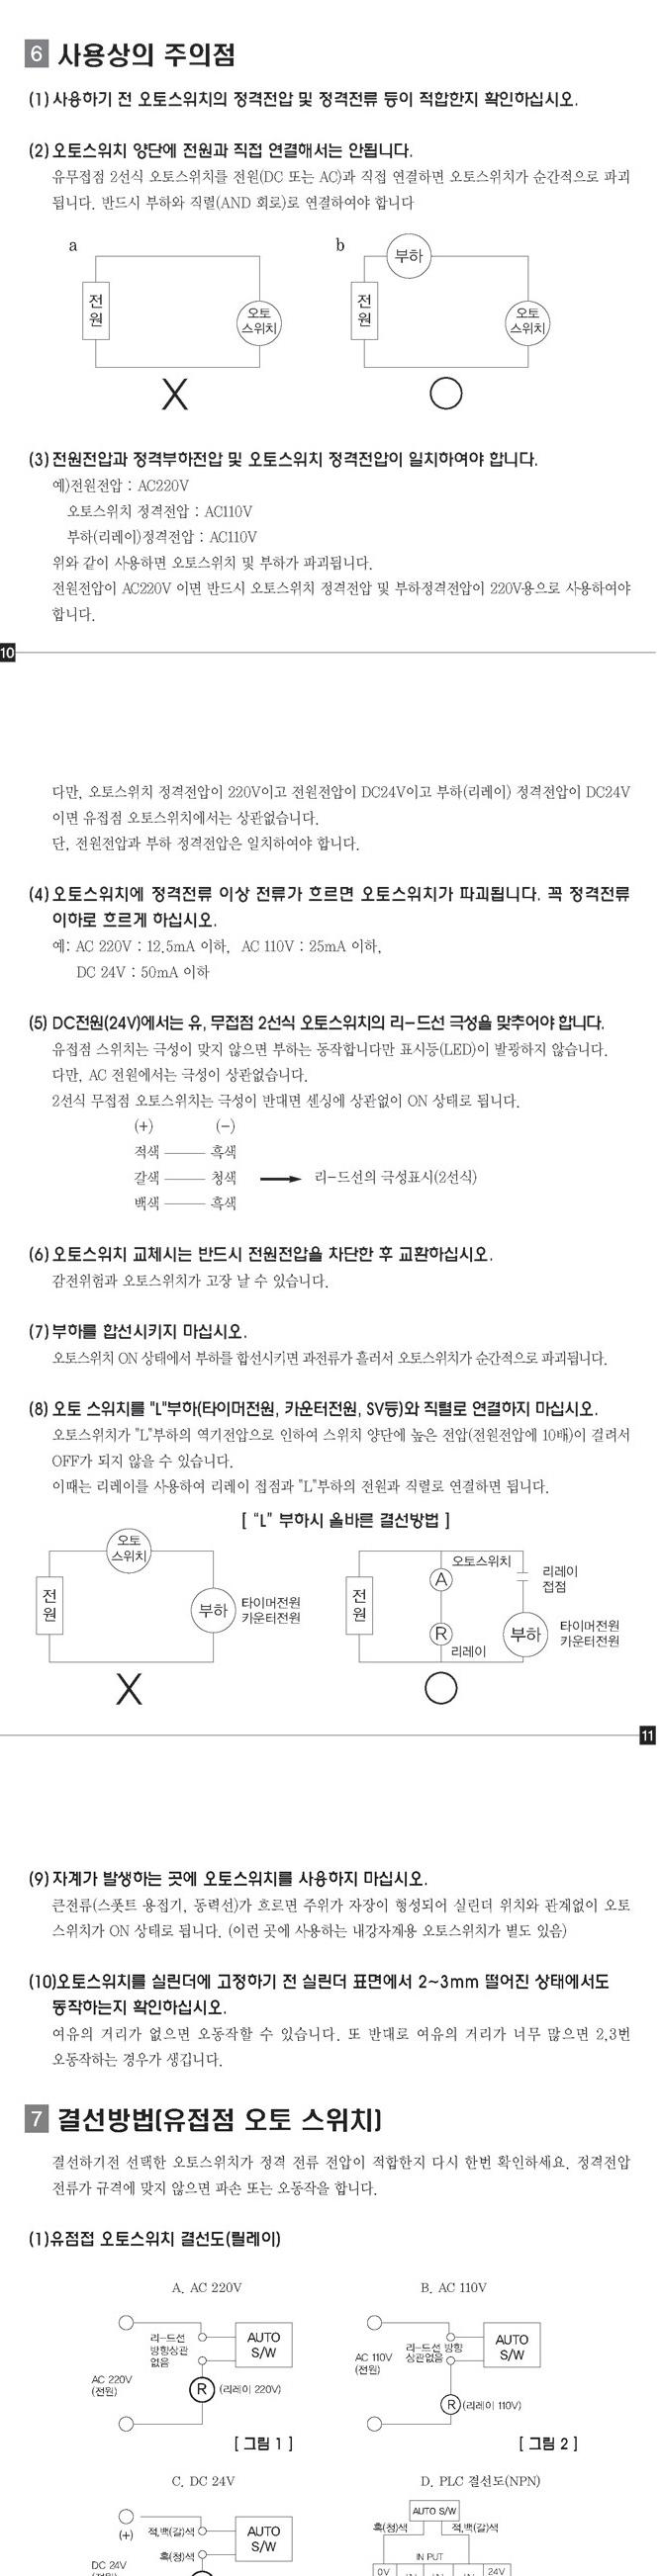 Saewon Electronics Auto Switches Terminology  3